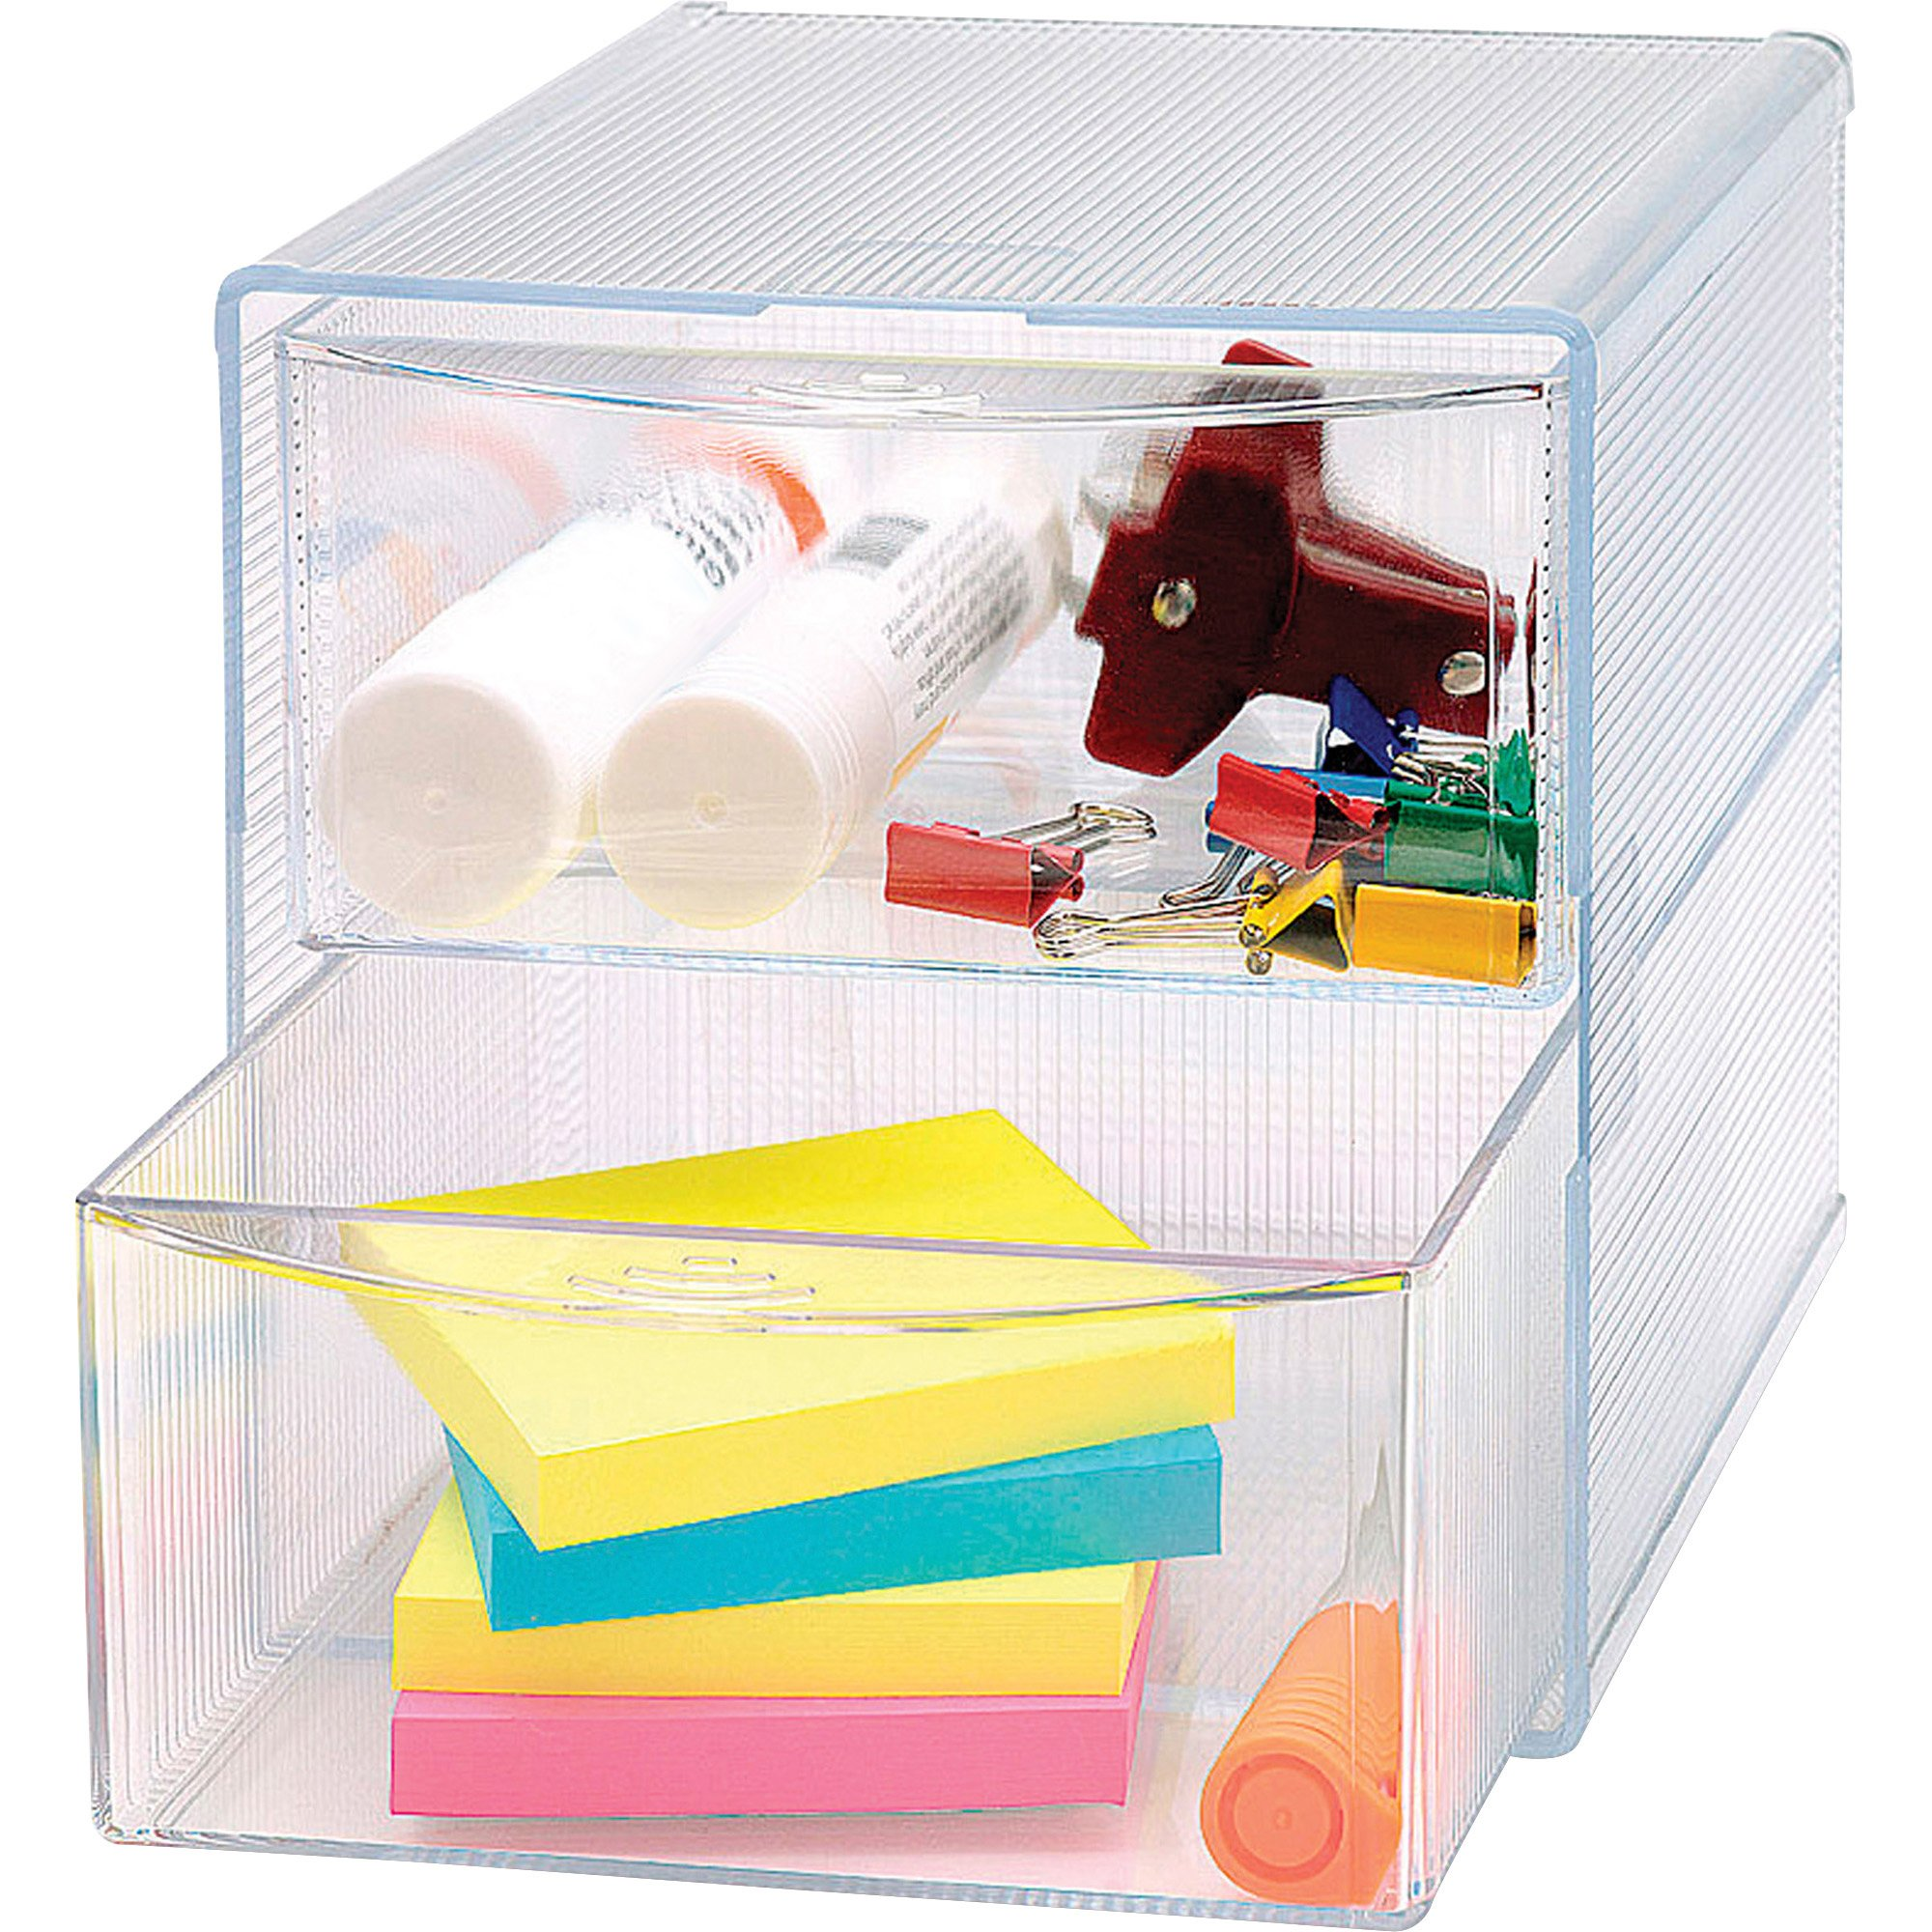 Sparco Storage Organizer, 2 Drawer, 6 x 6 x 6 Inches, Clear(SPR82978)